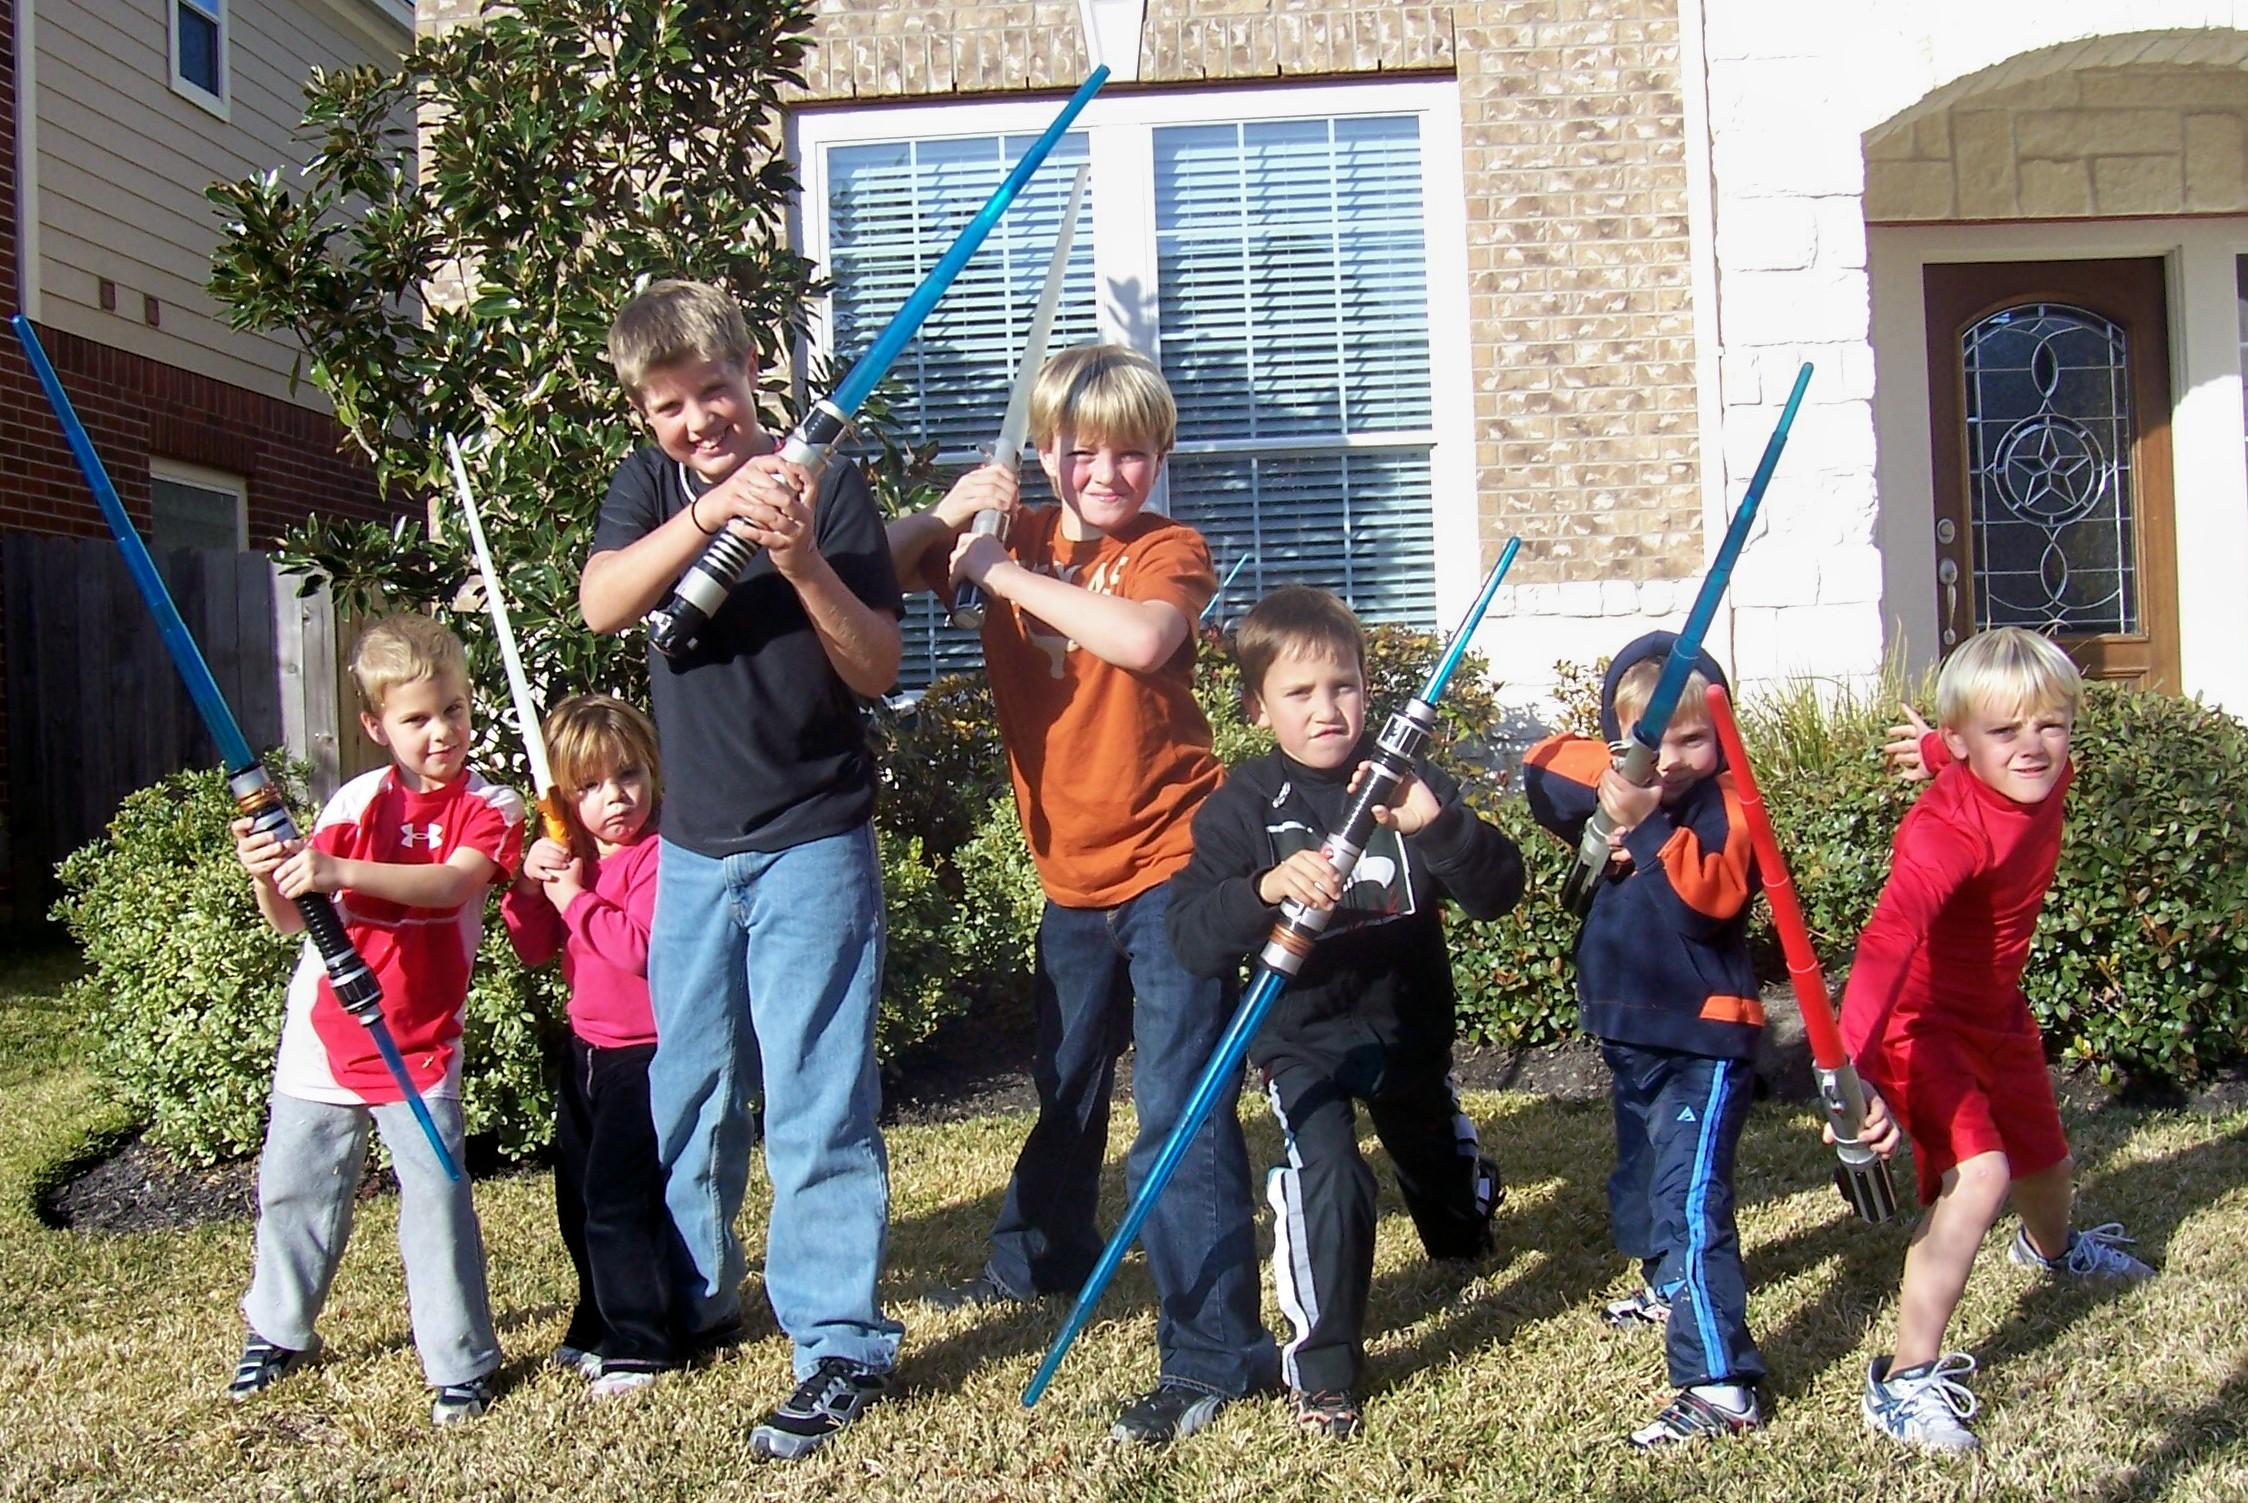 Neighborhood Star Wars